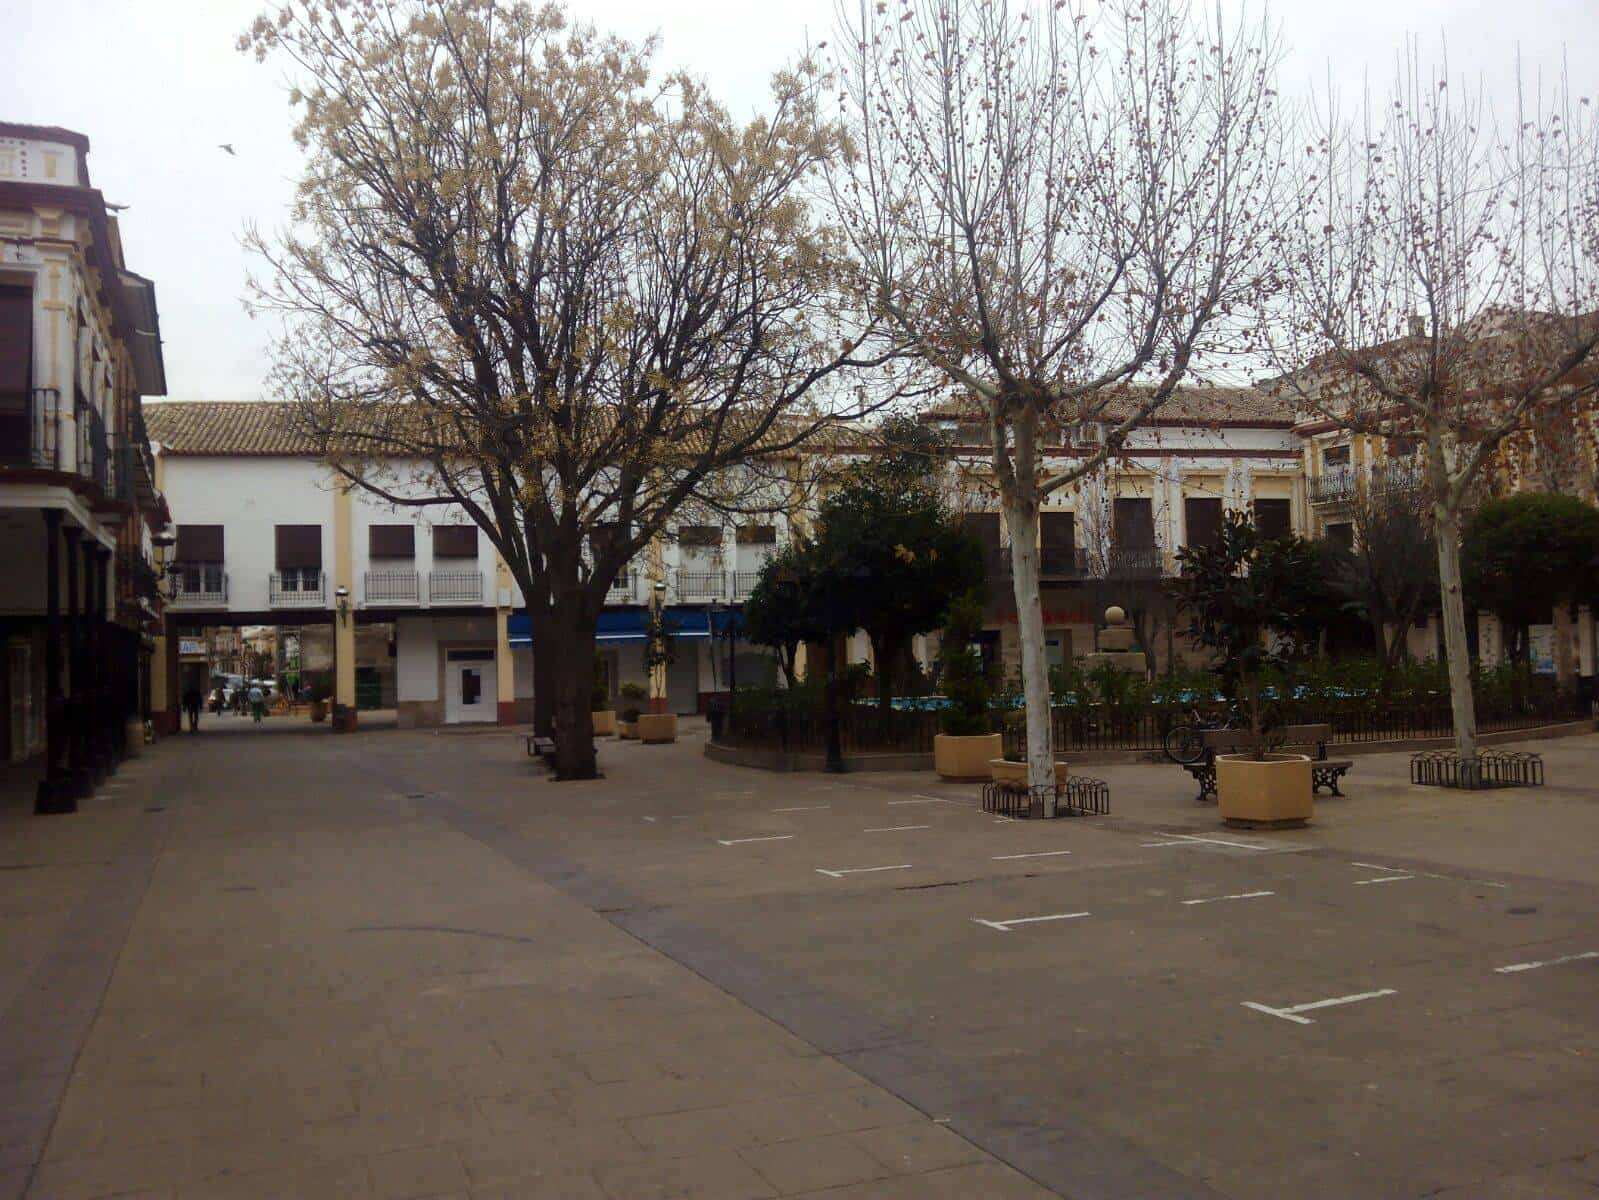 plaza espana herencia - Herencia convoca pleno ordinario para este jueves